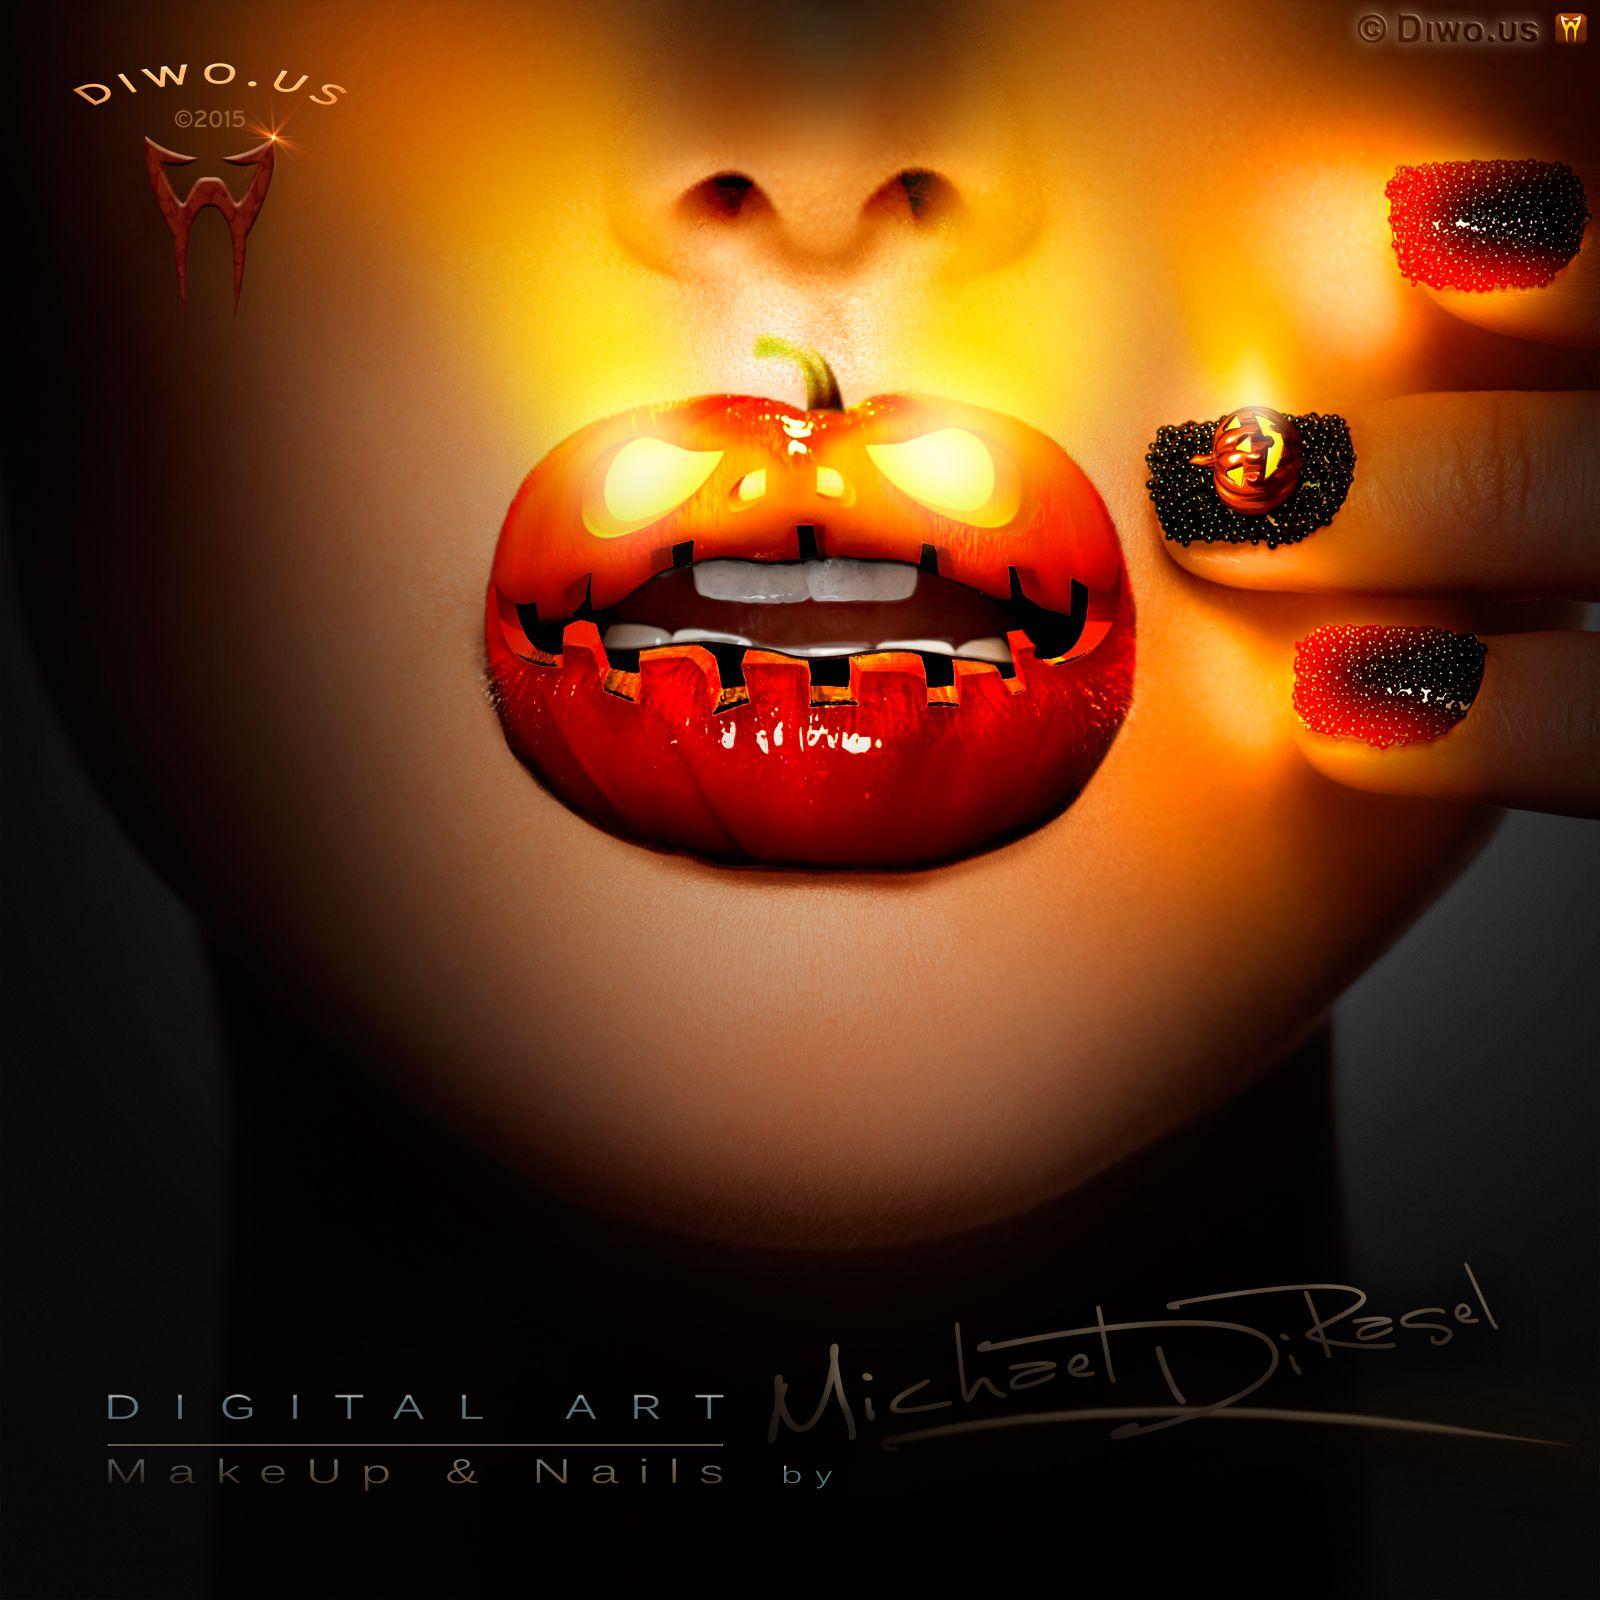 Diwous - Digital Art - Electric Pumpkin & Caviar, Halloween, MakeUp and Nails, beauty, digitální grafika, nehty, diwoart, diwousart, fantasy, glamour, kresba, malba, photomanipulation, počítačová grafika, portrait, Virtual